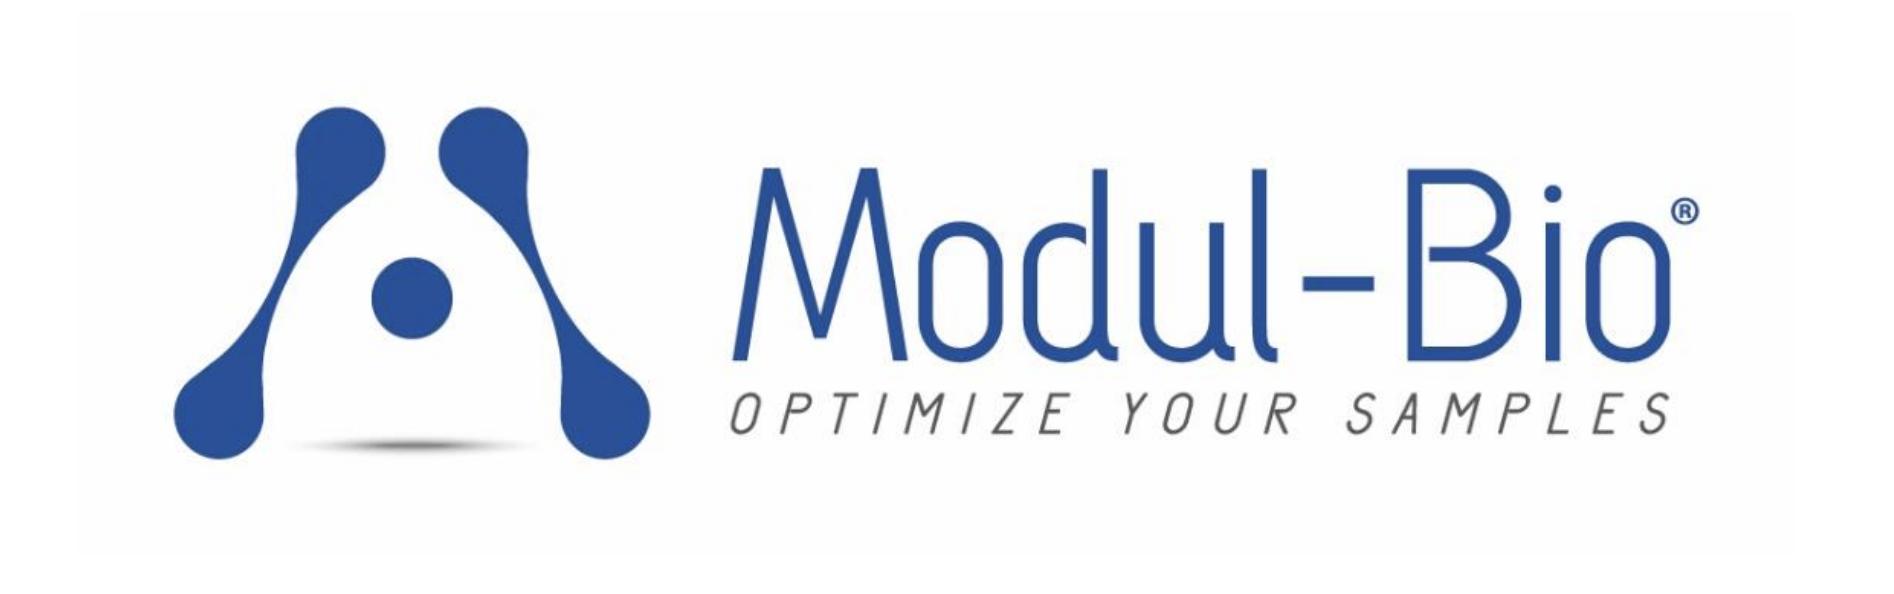 Modul_bio_BioTech_Pharma_Summit_logo